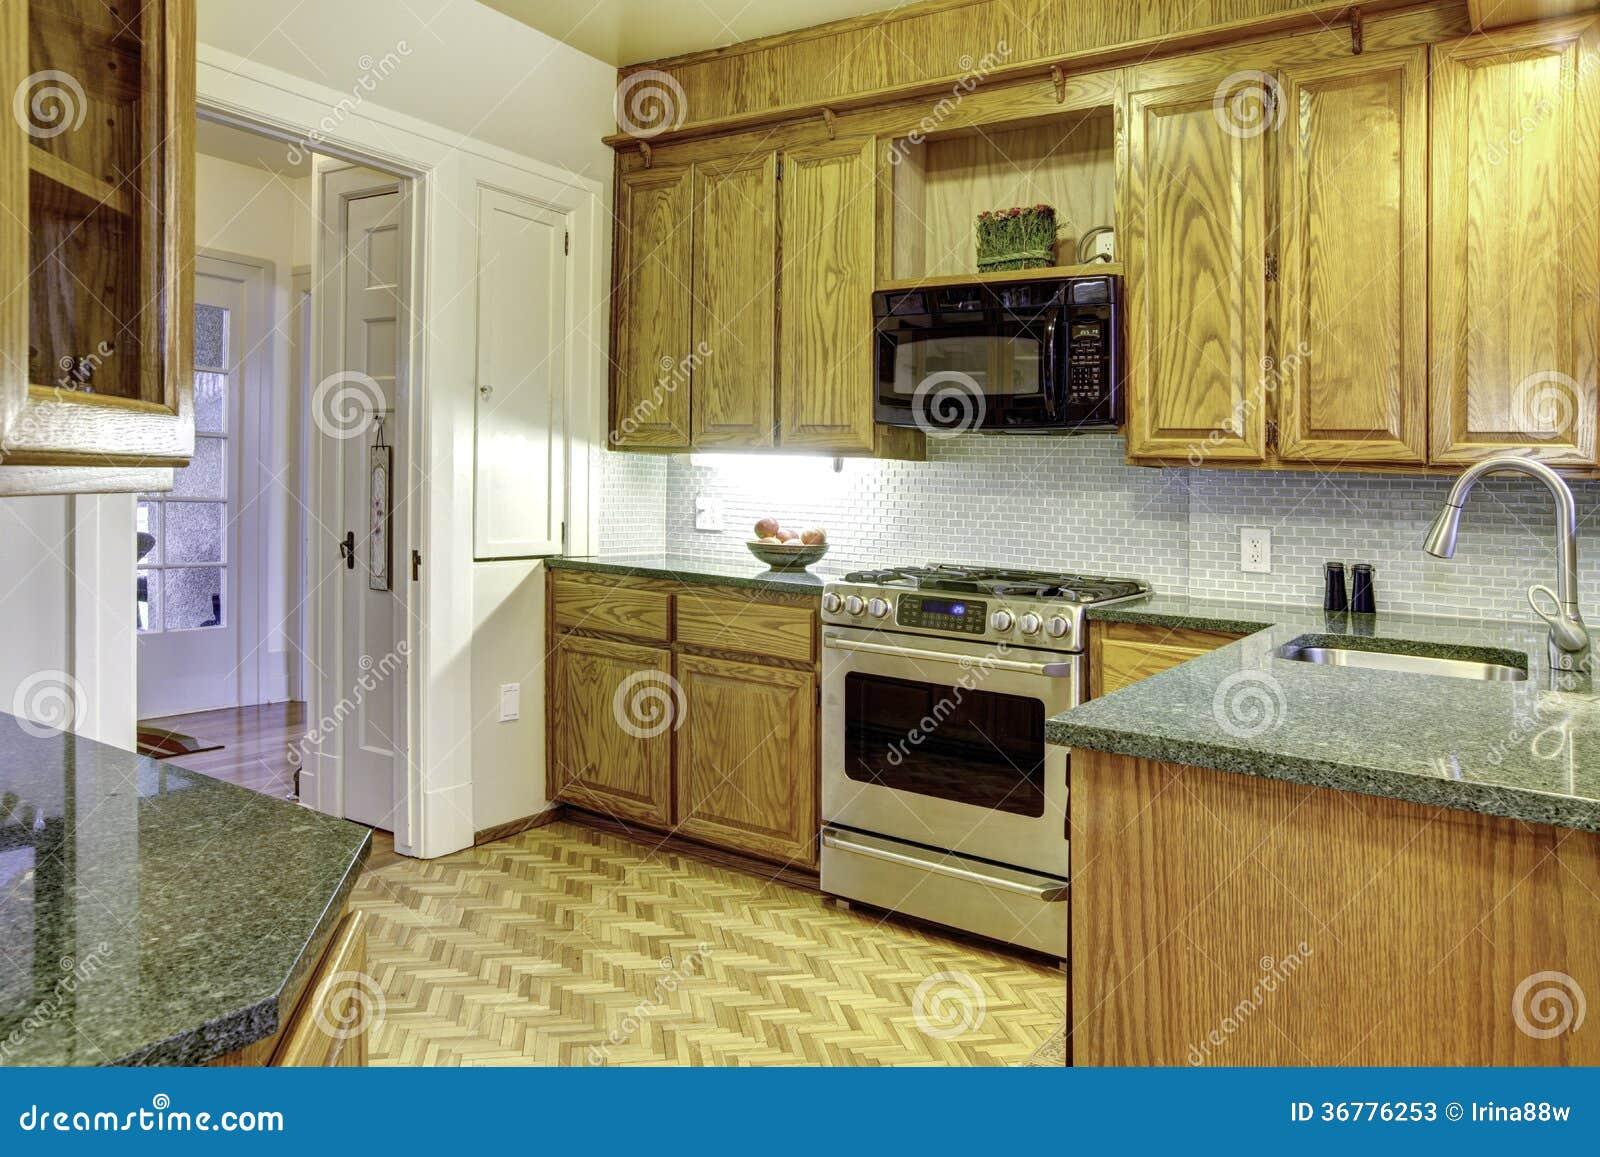 Petite cuisine confortable photos stock   image: 36776253